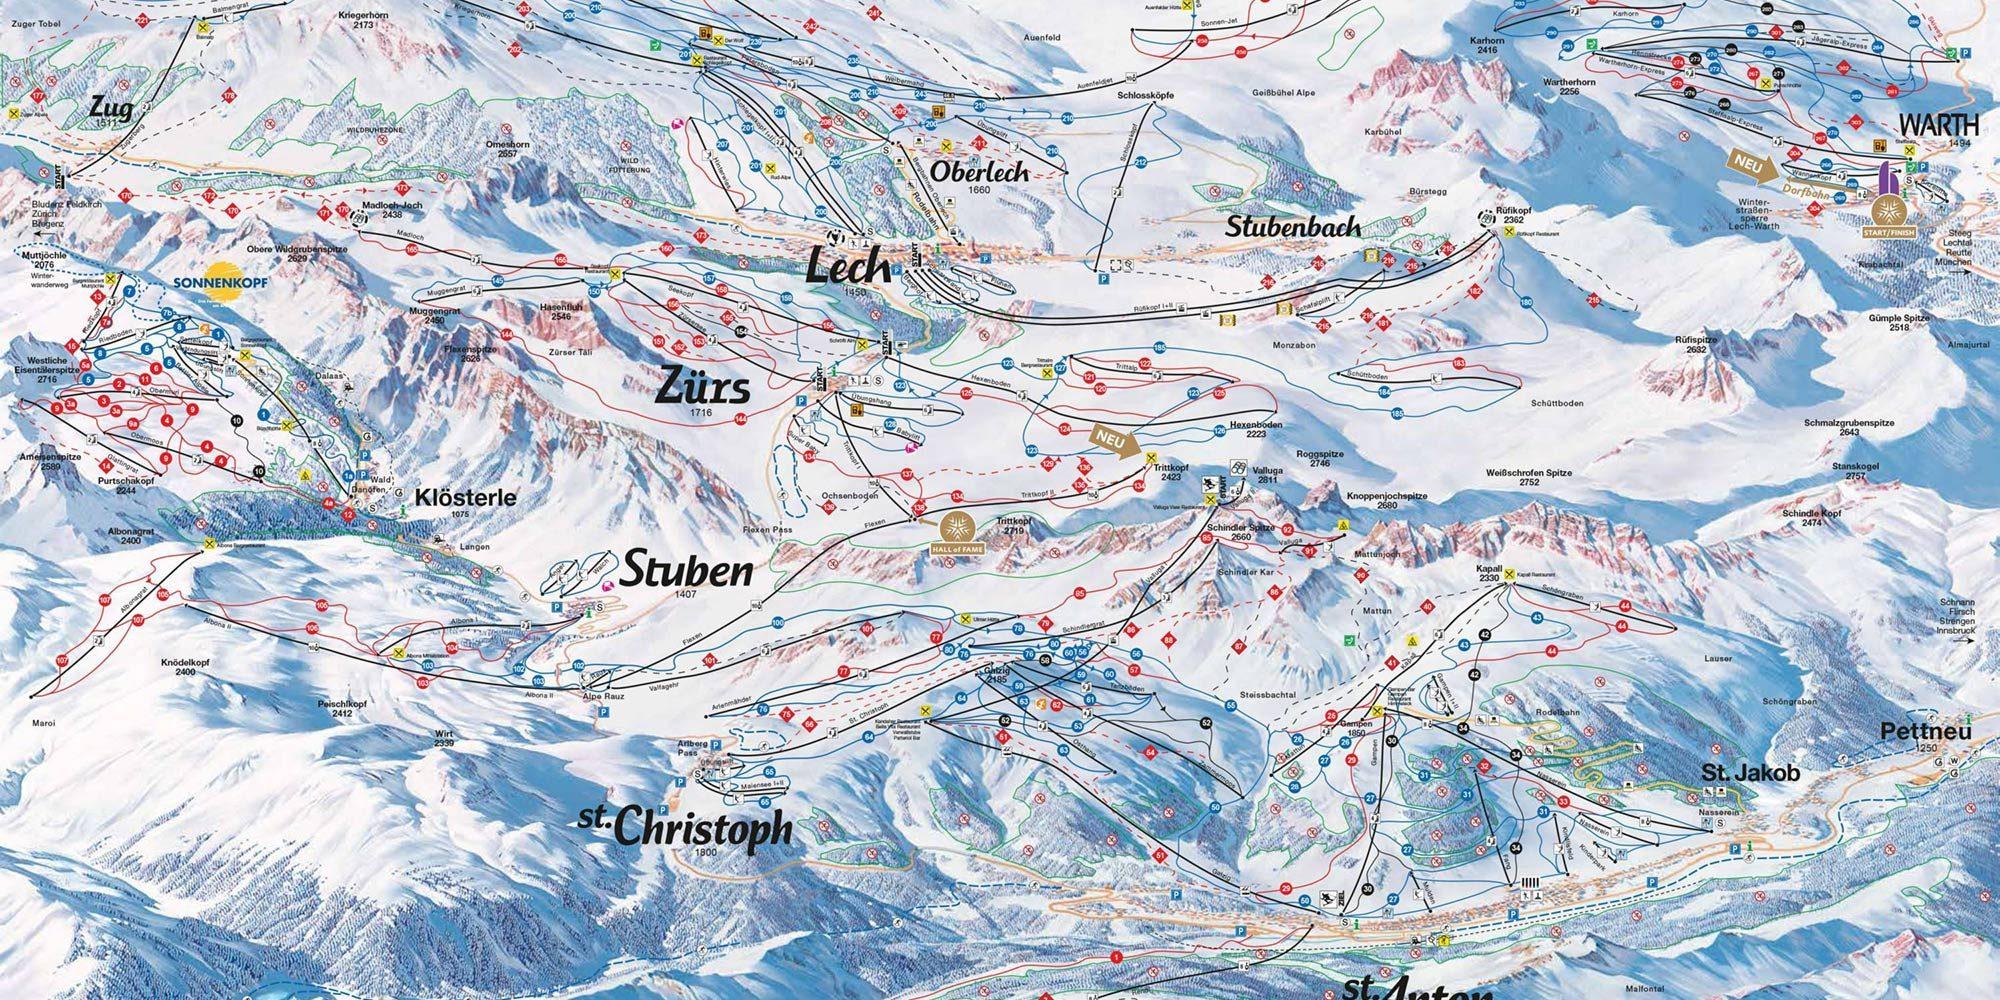 St Christoph, St Anton, Lech, Ski Map 2018